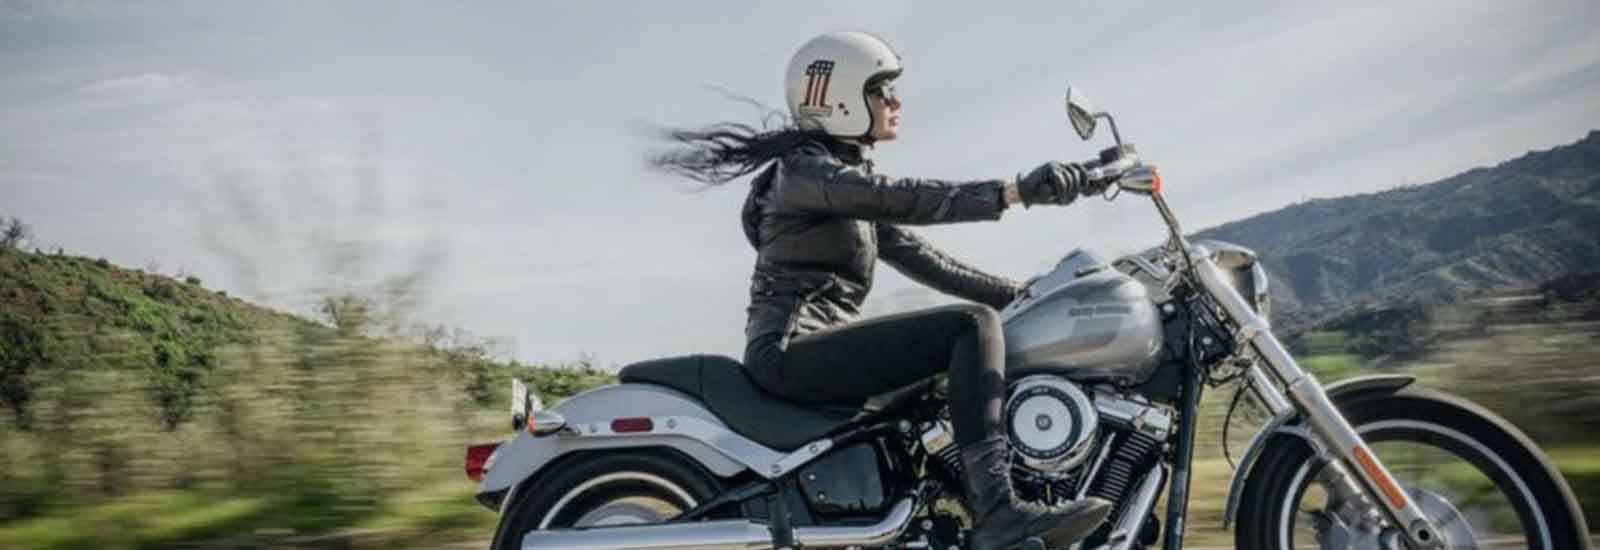 Houston Motorcycle Insurance